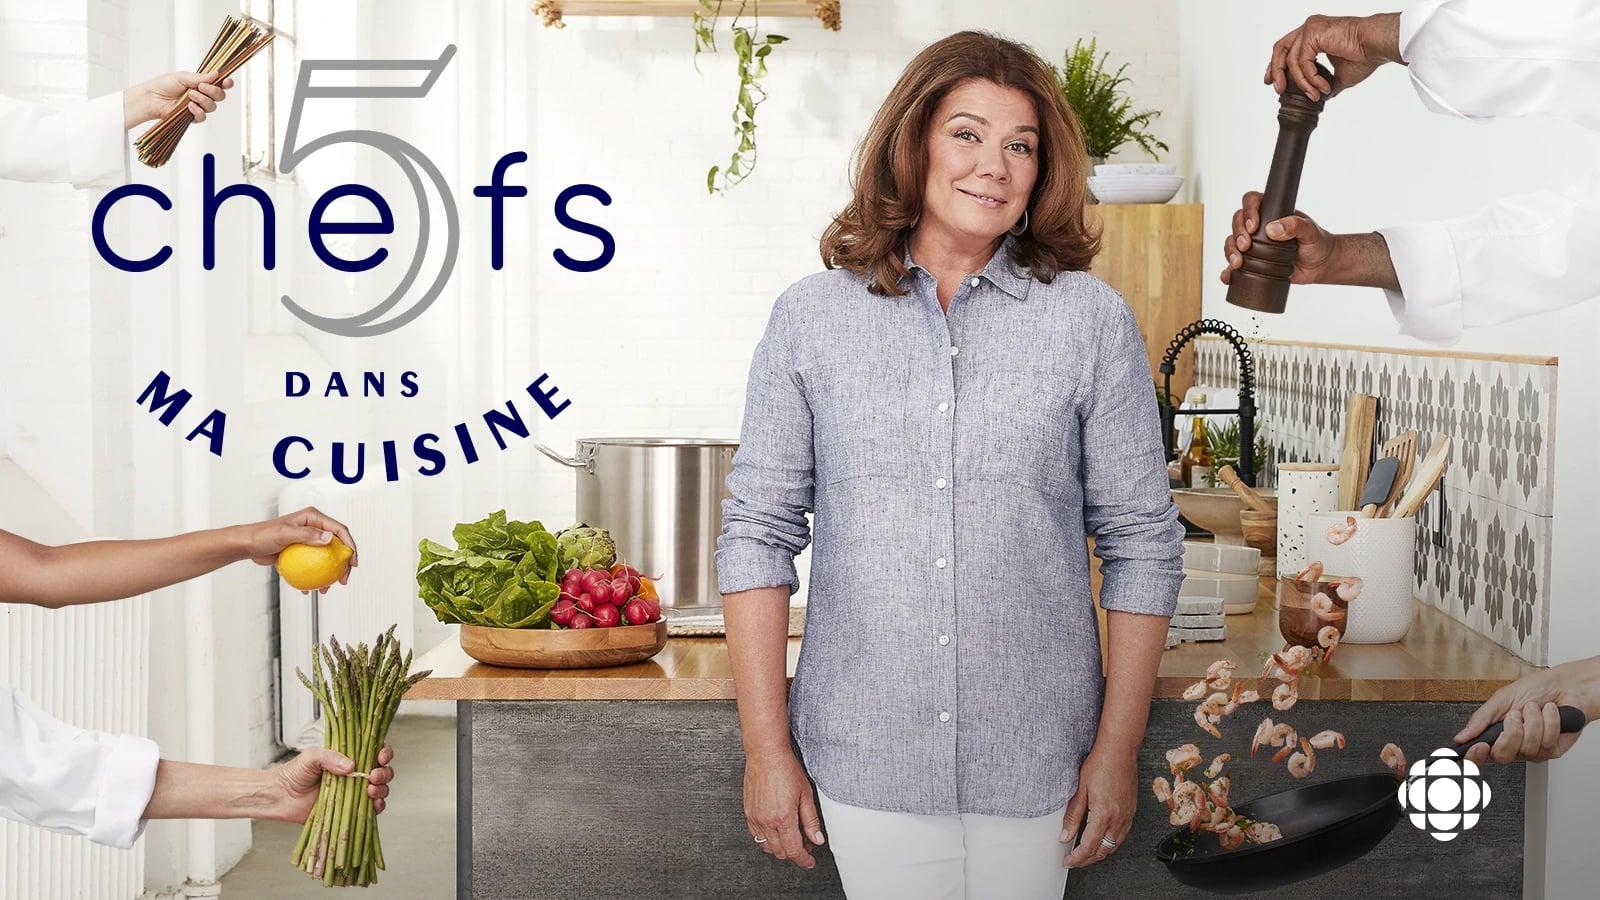 5 chefs dans ma cuisine - Season 2